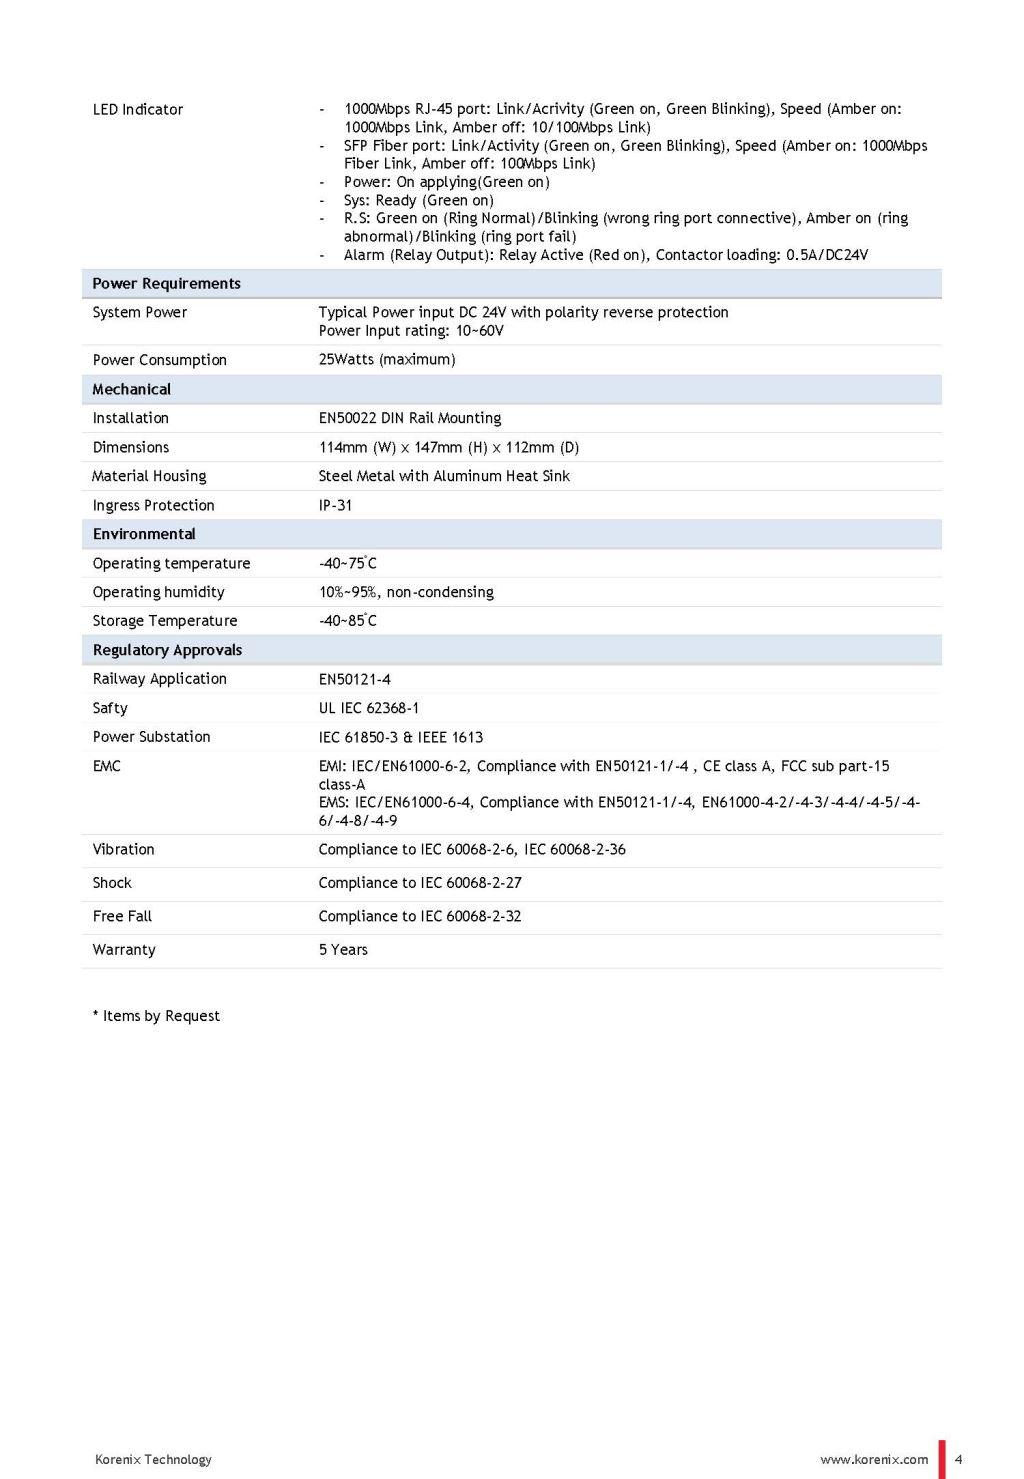 korenix JetNet 7020G Industrial Gigabit Ethernet L3 Switch